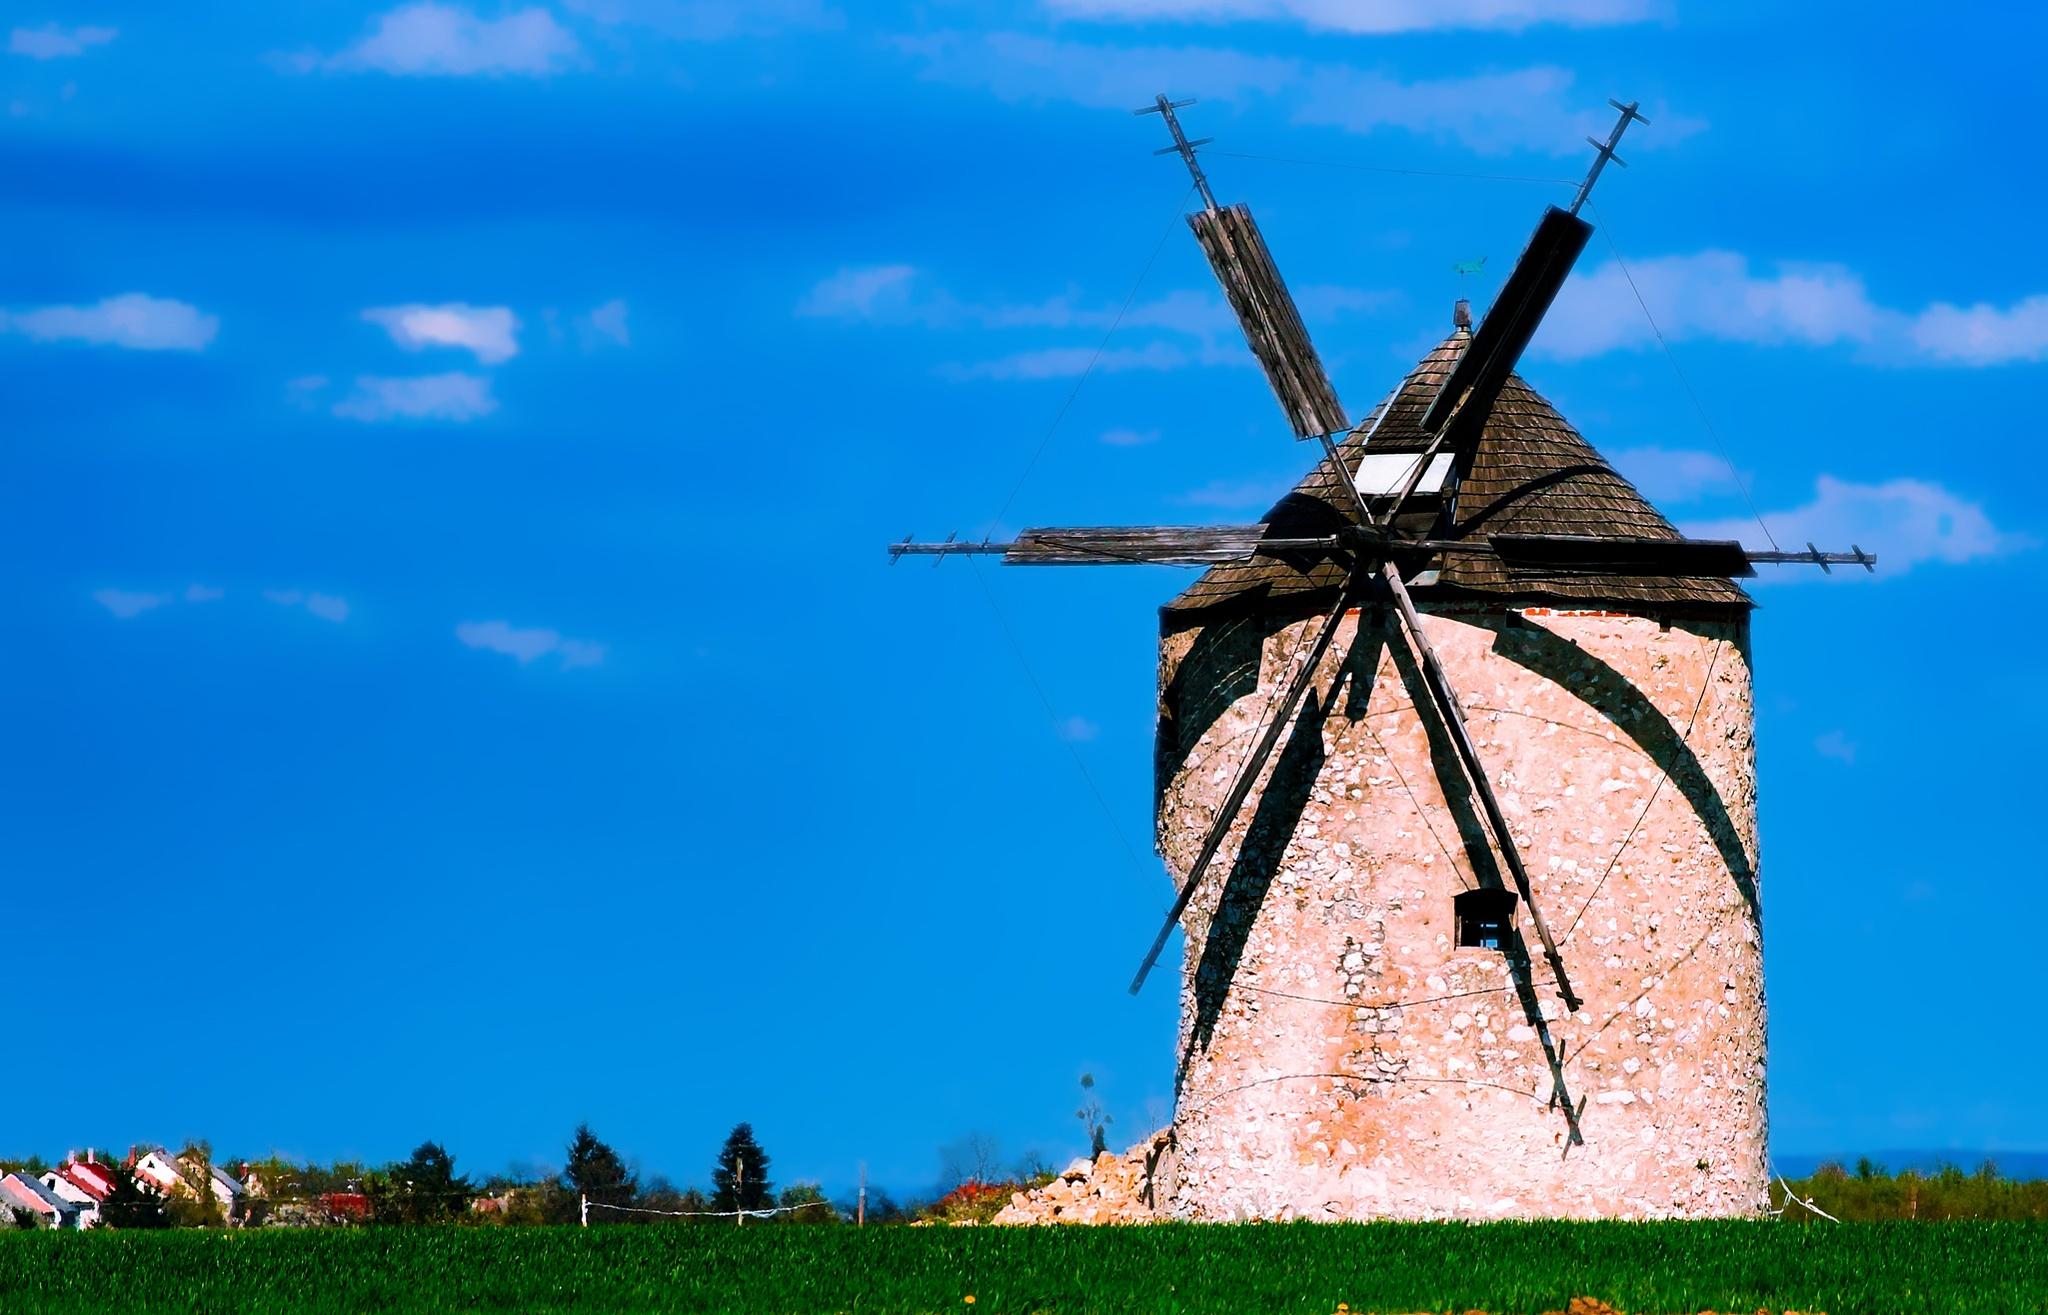 Windmill - Tés - Hungary by Tamas Filep